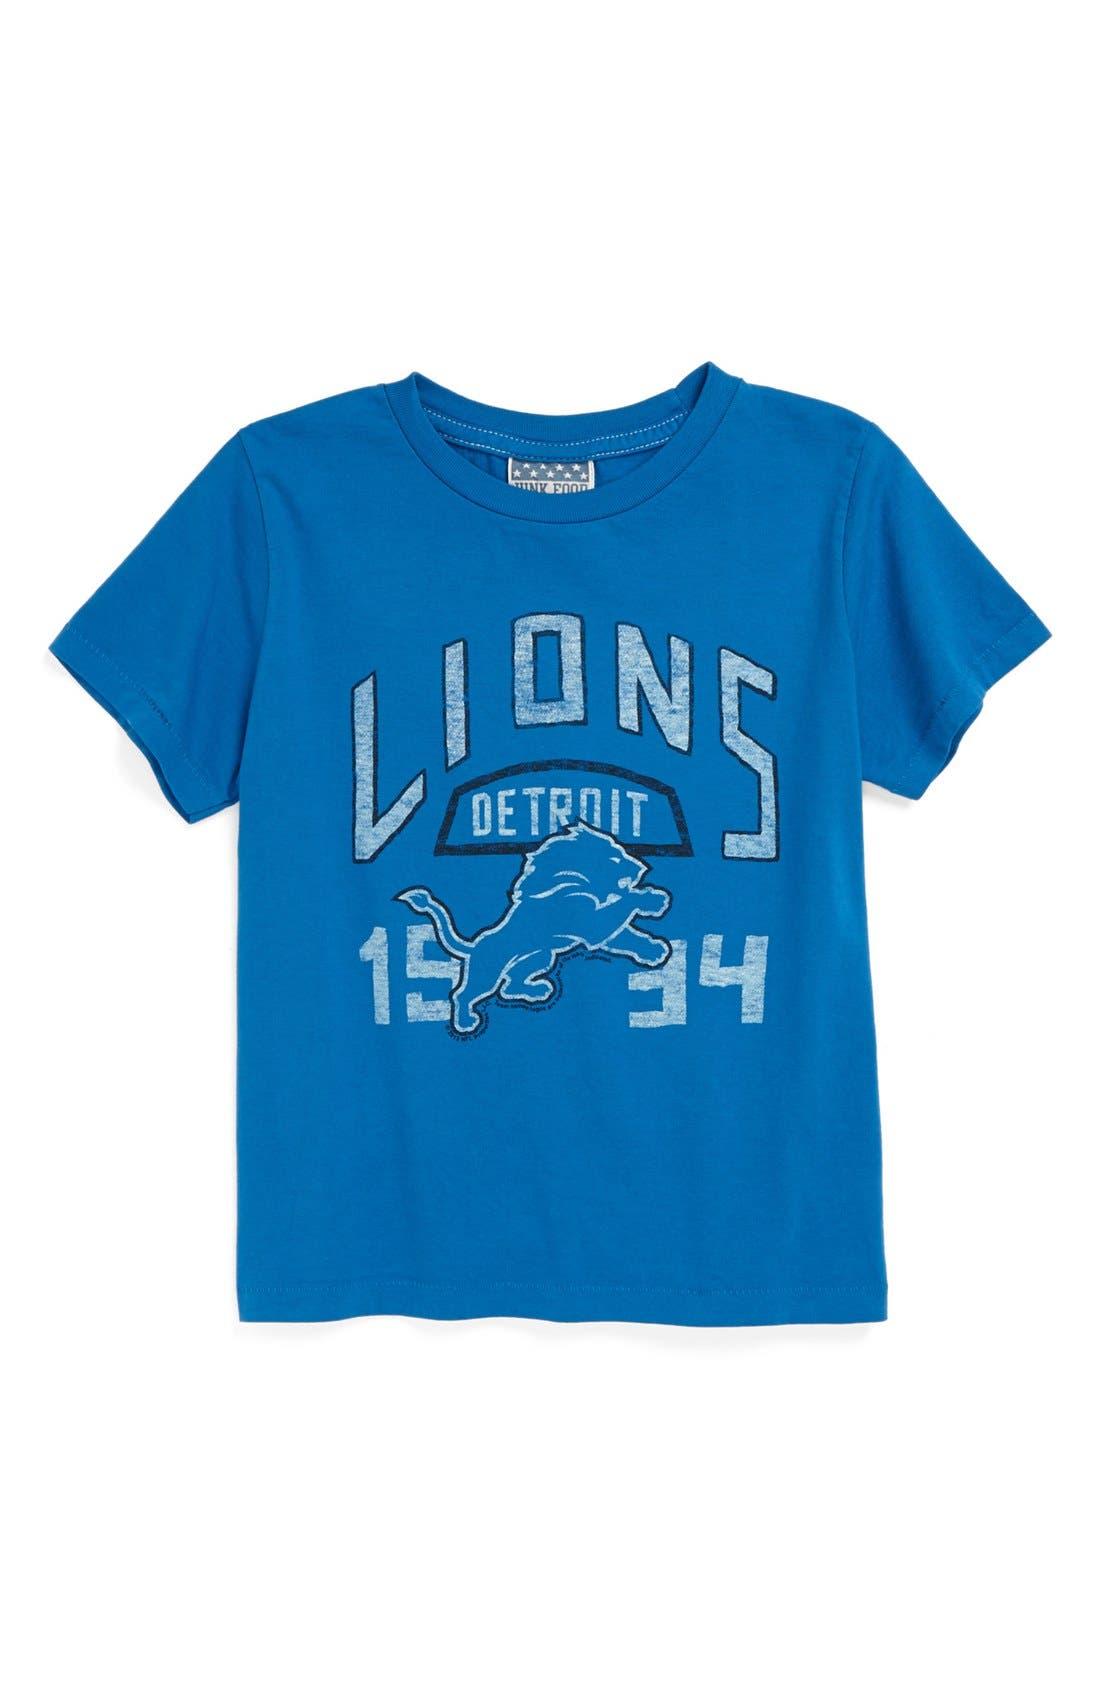 Alternate Image 1 Selected - Junk Food 'Detroit Lions' T-Shirt (Toddler Boys)